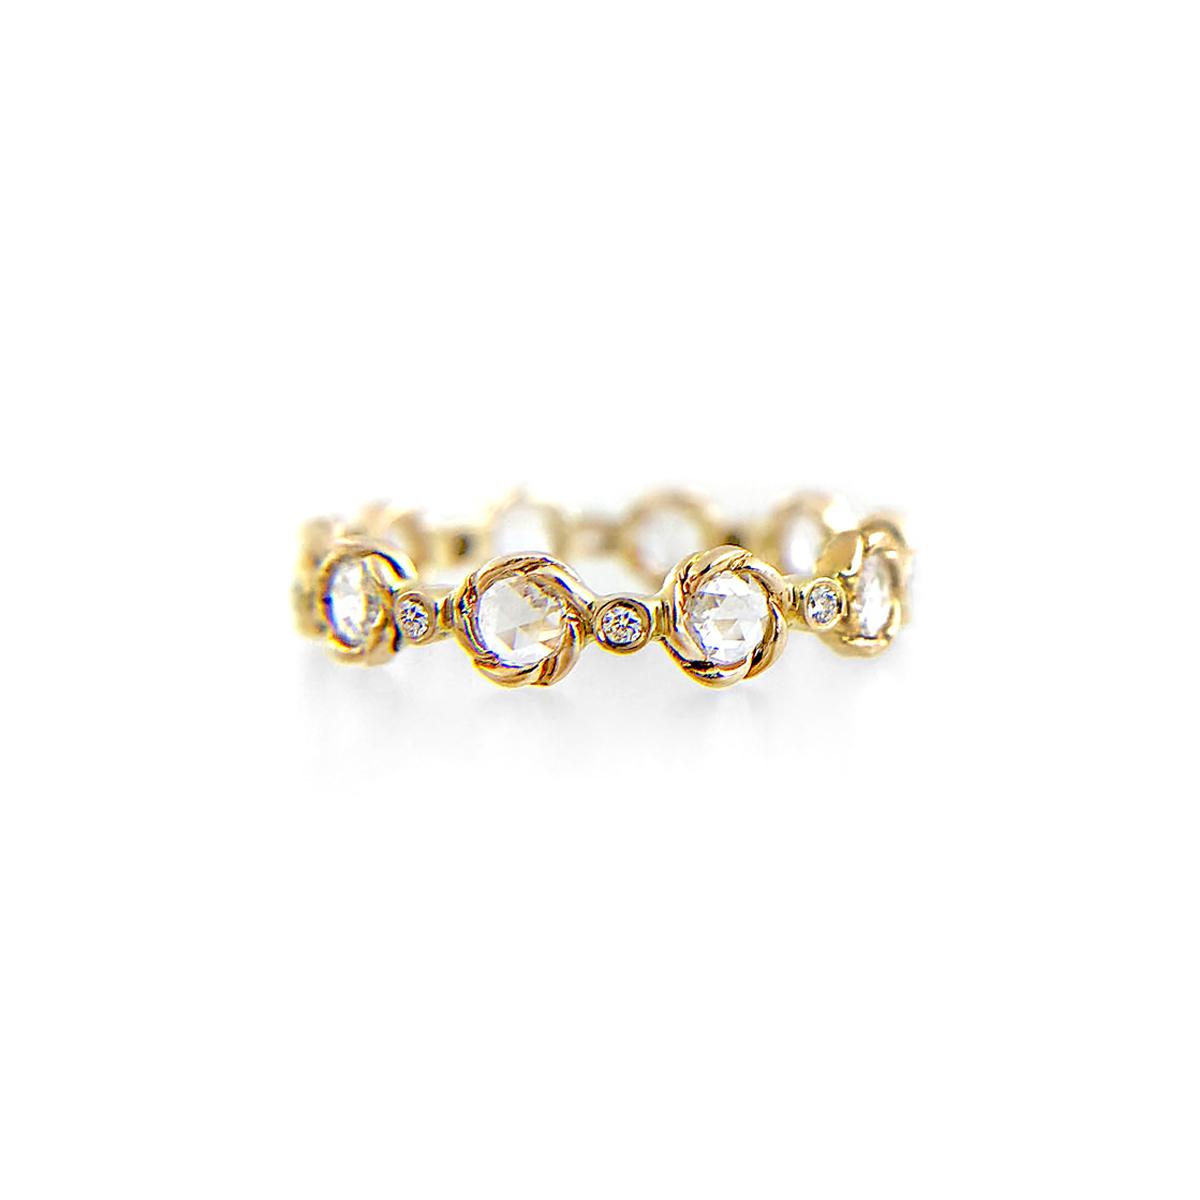 21-Signature-Twist-Bezel-4mm-Rose-Cut-Diamond-Eternity-Gold-Ring-14k-18k-JeweLyrie-C_3382